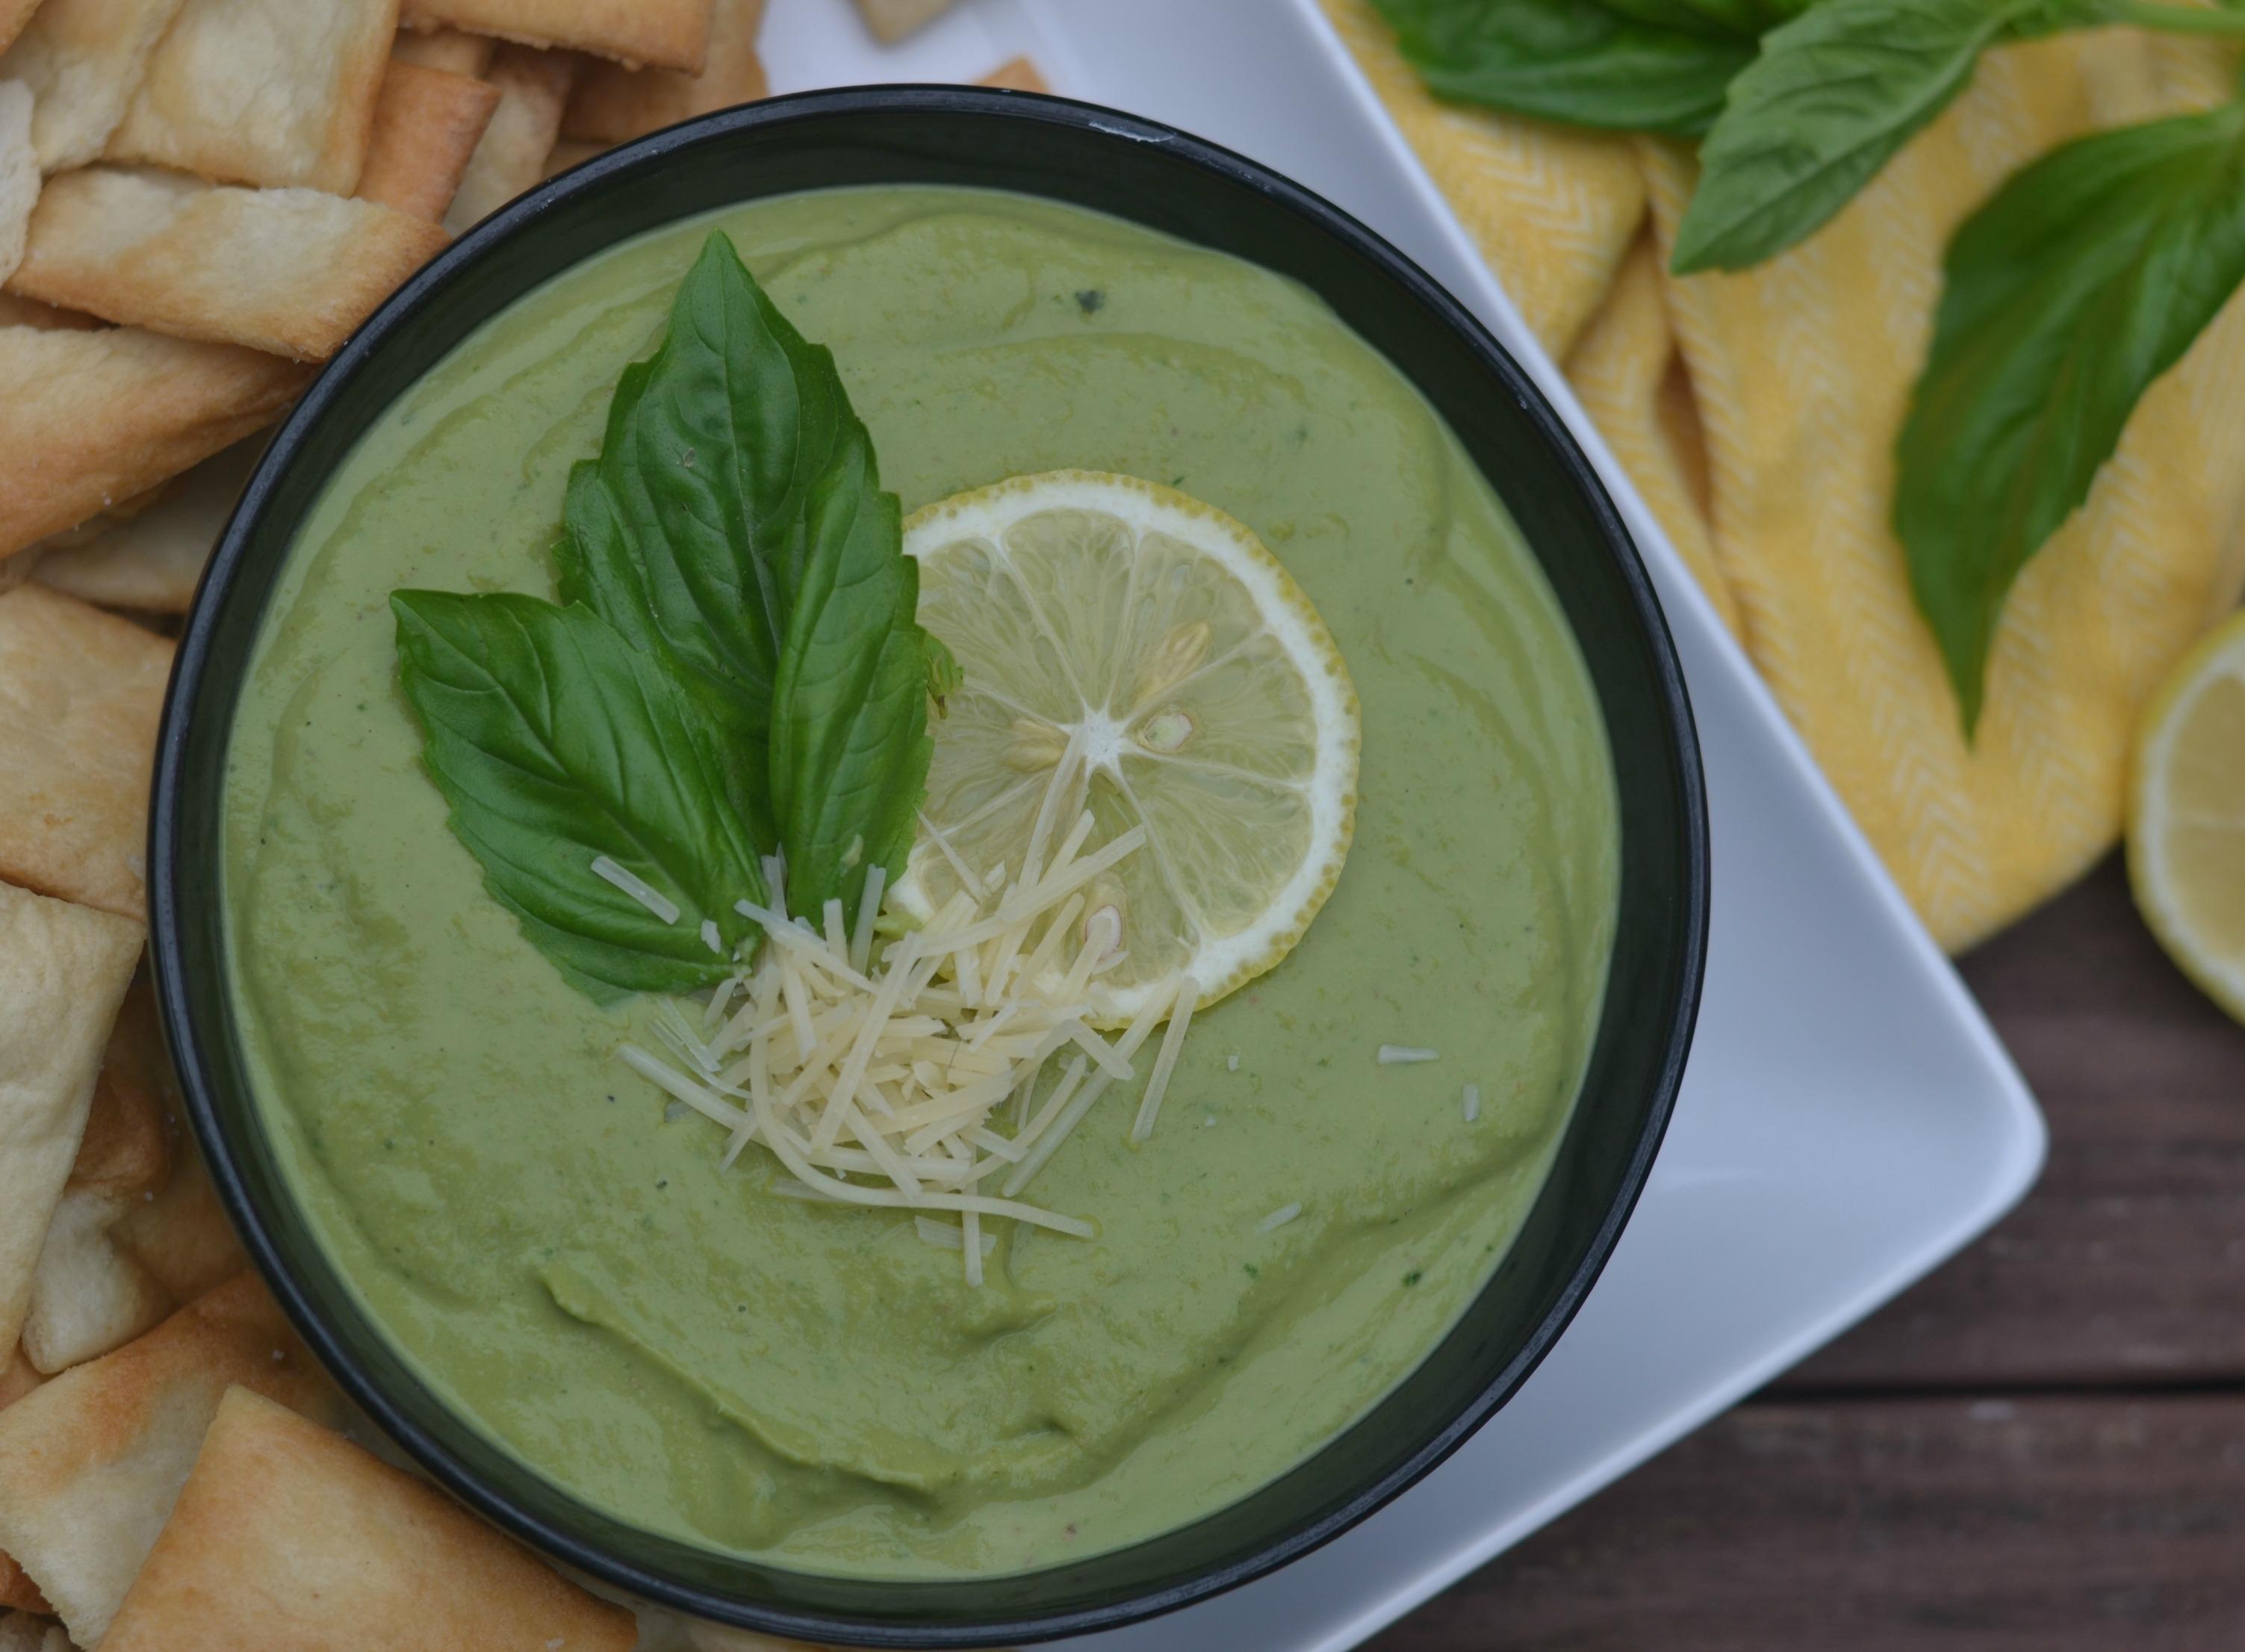 Zoes Kitchen Pesto Hummus Recipe